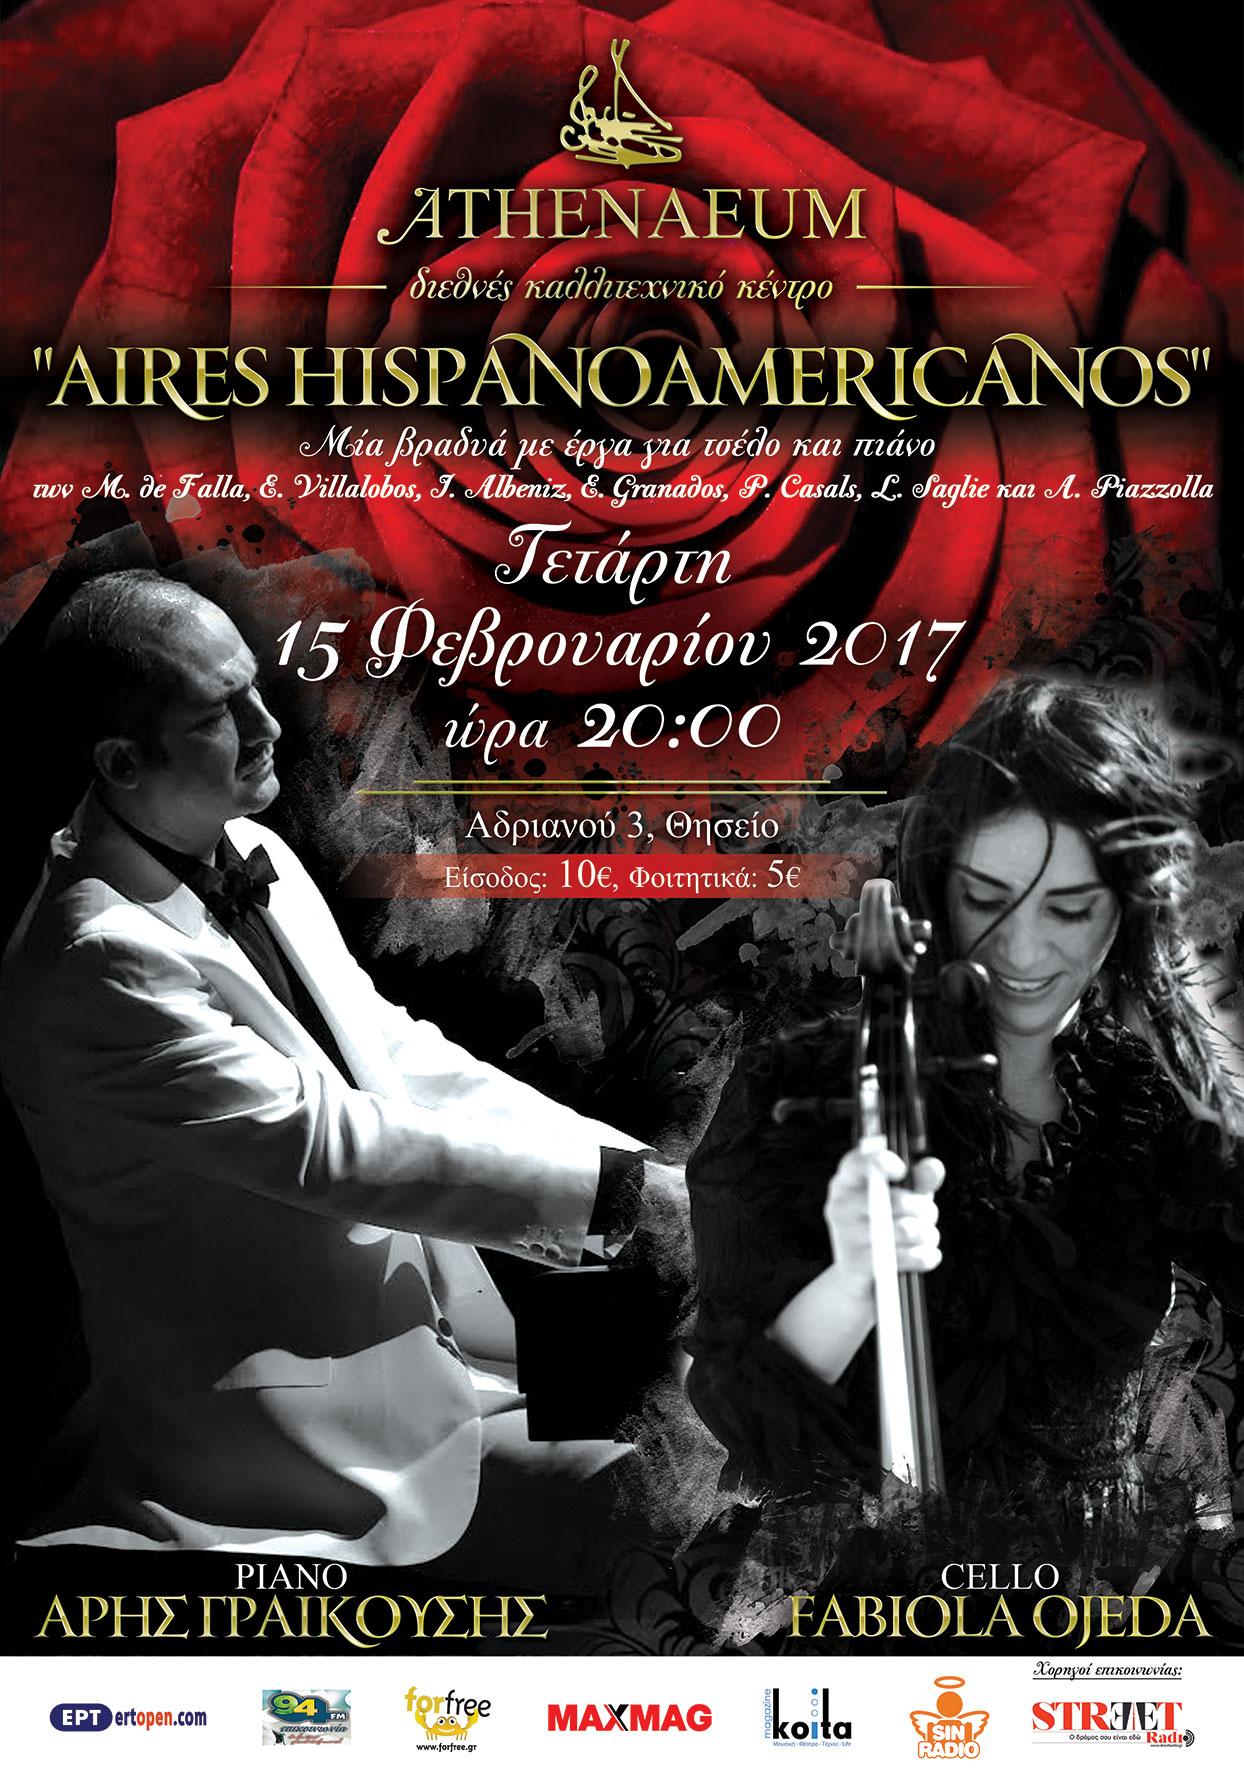 aires_hispanoamericanos_aris_graikousis_fabiola_ojeda